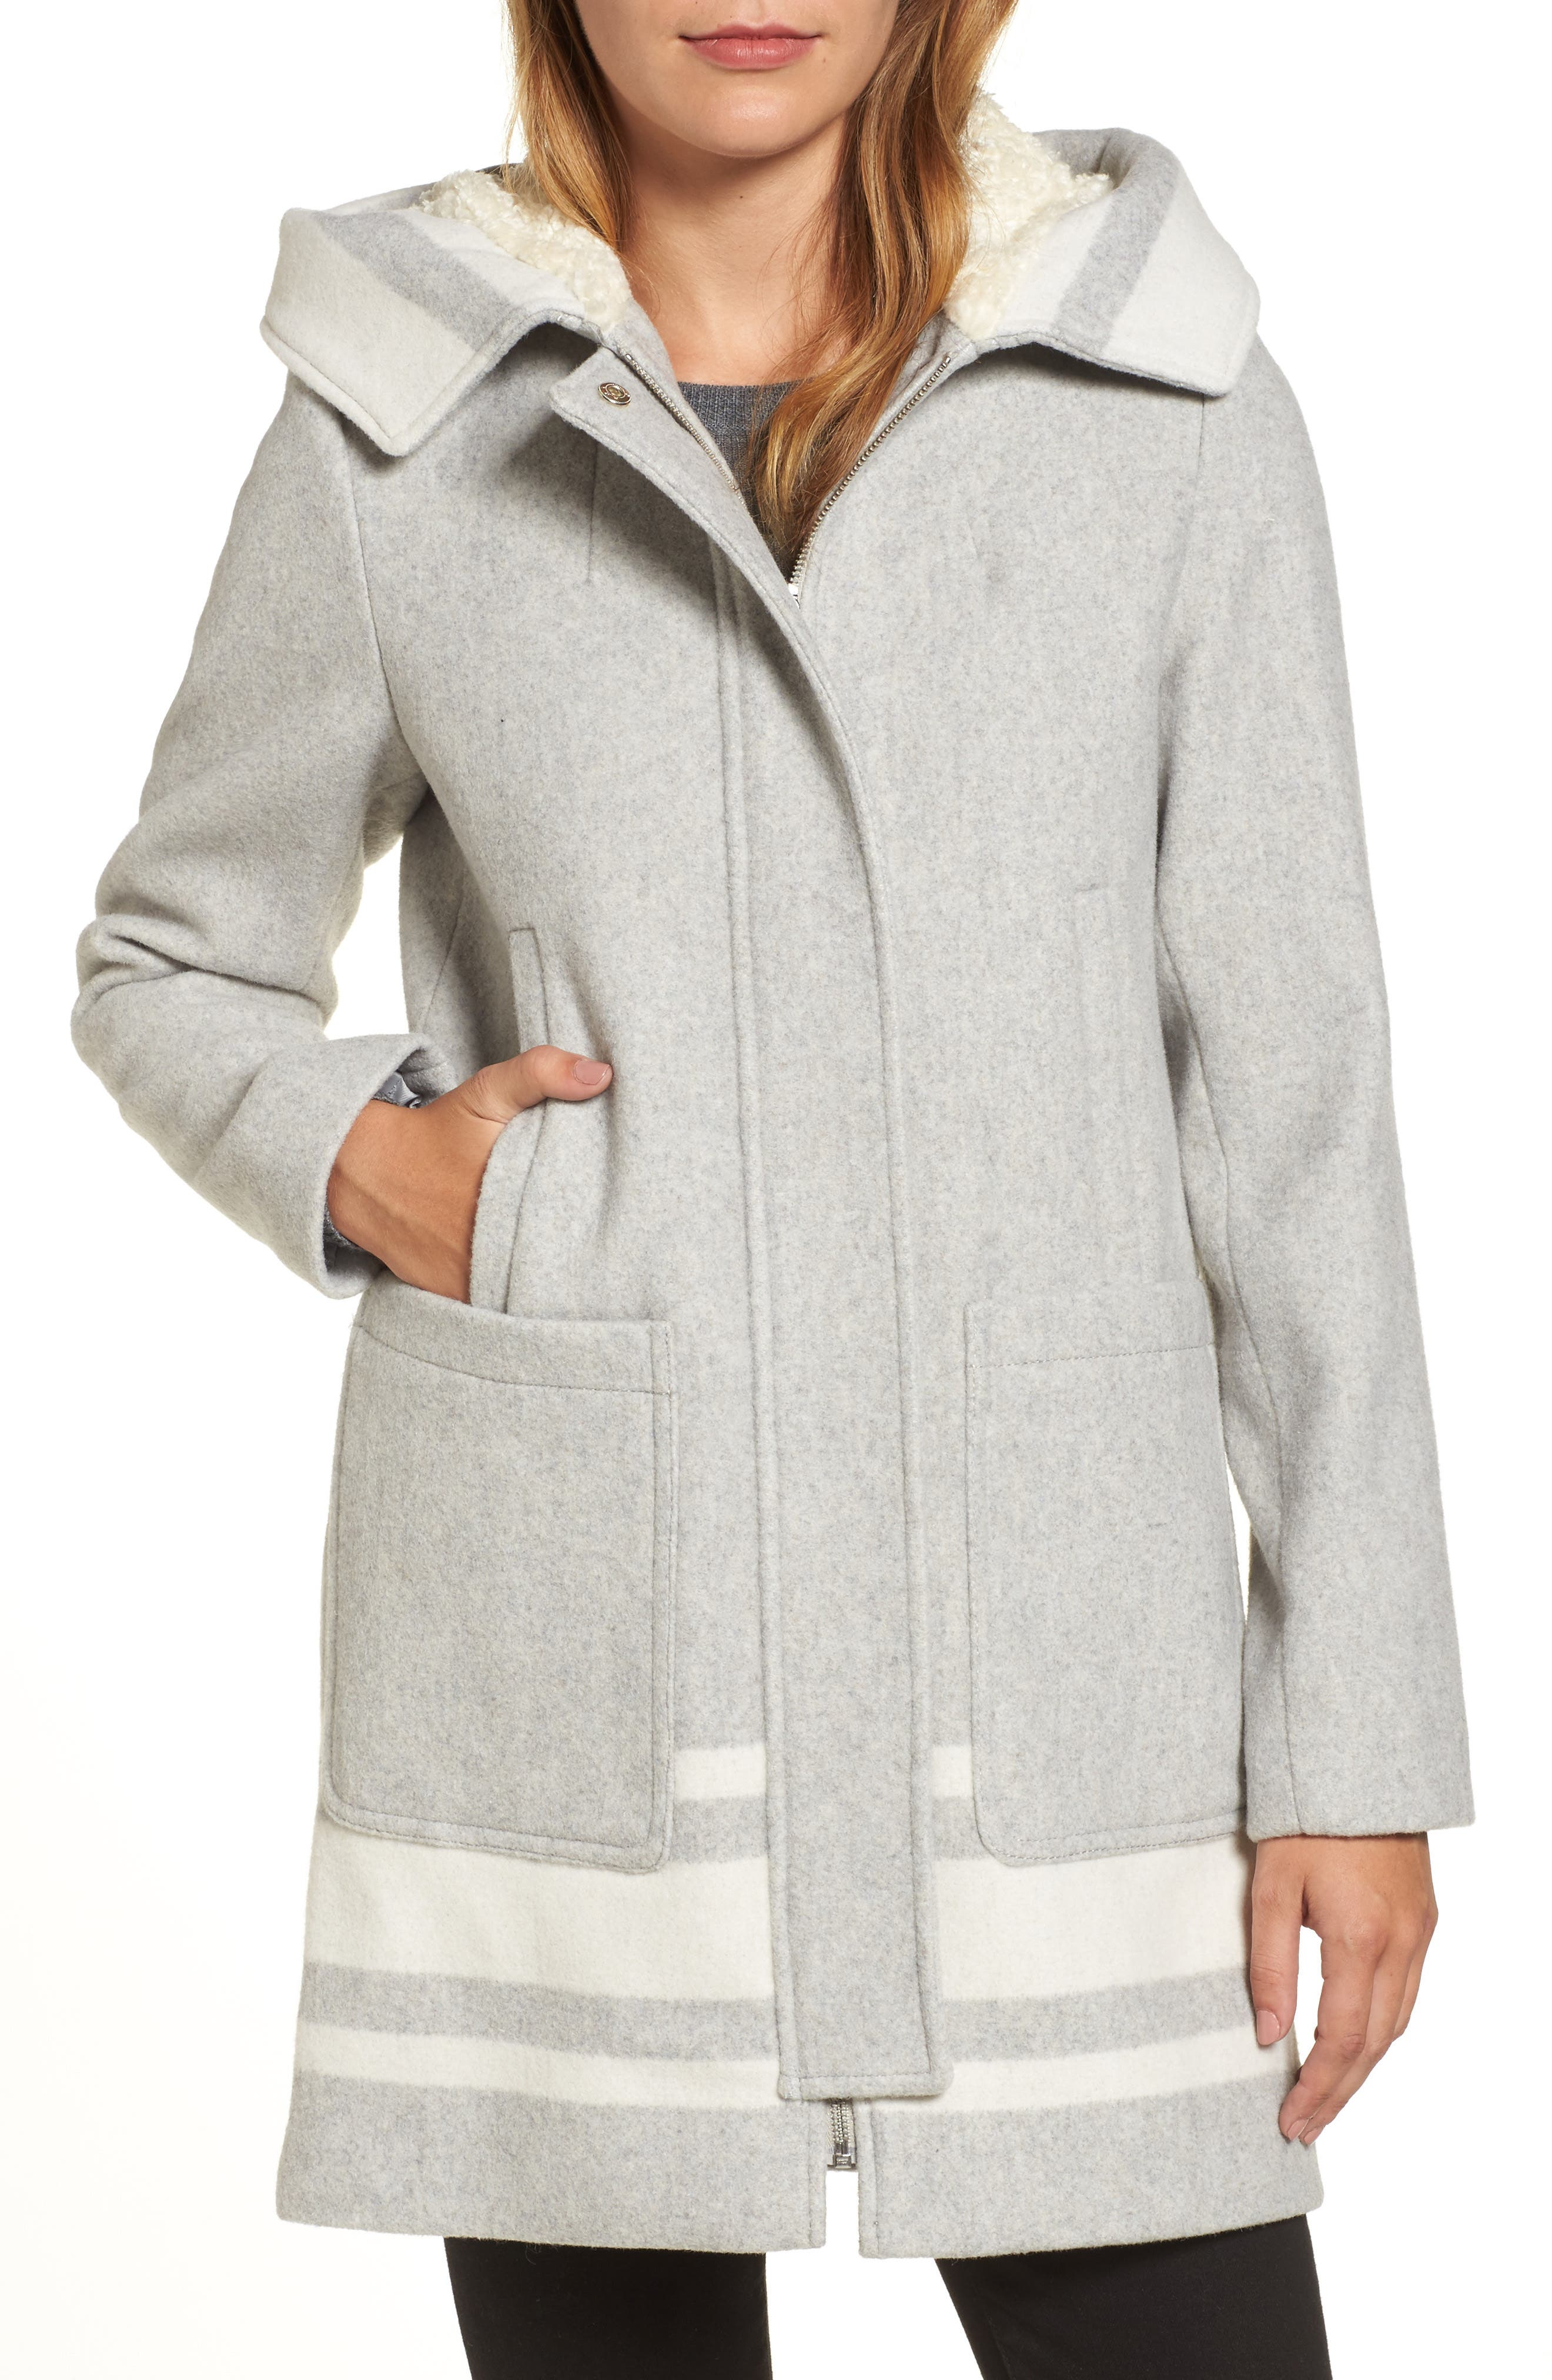 Hooded Car Coat,                         Main,                         color, 020